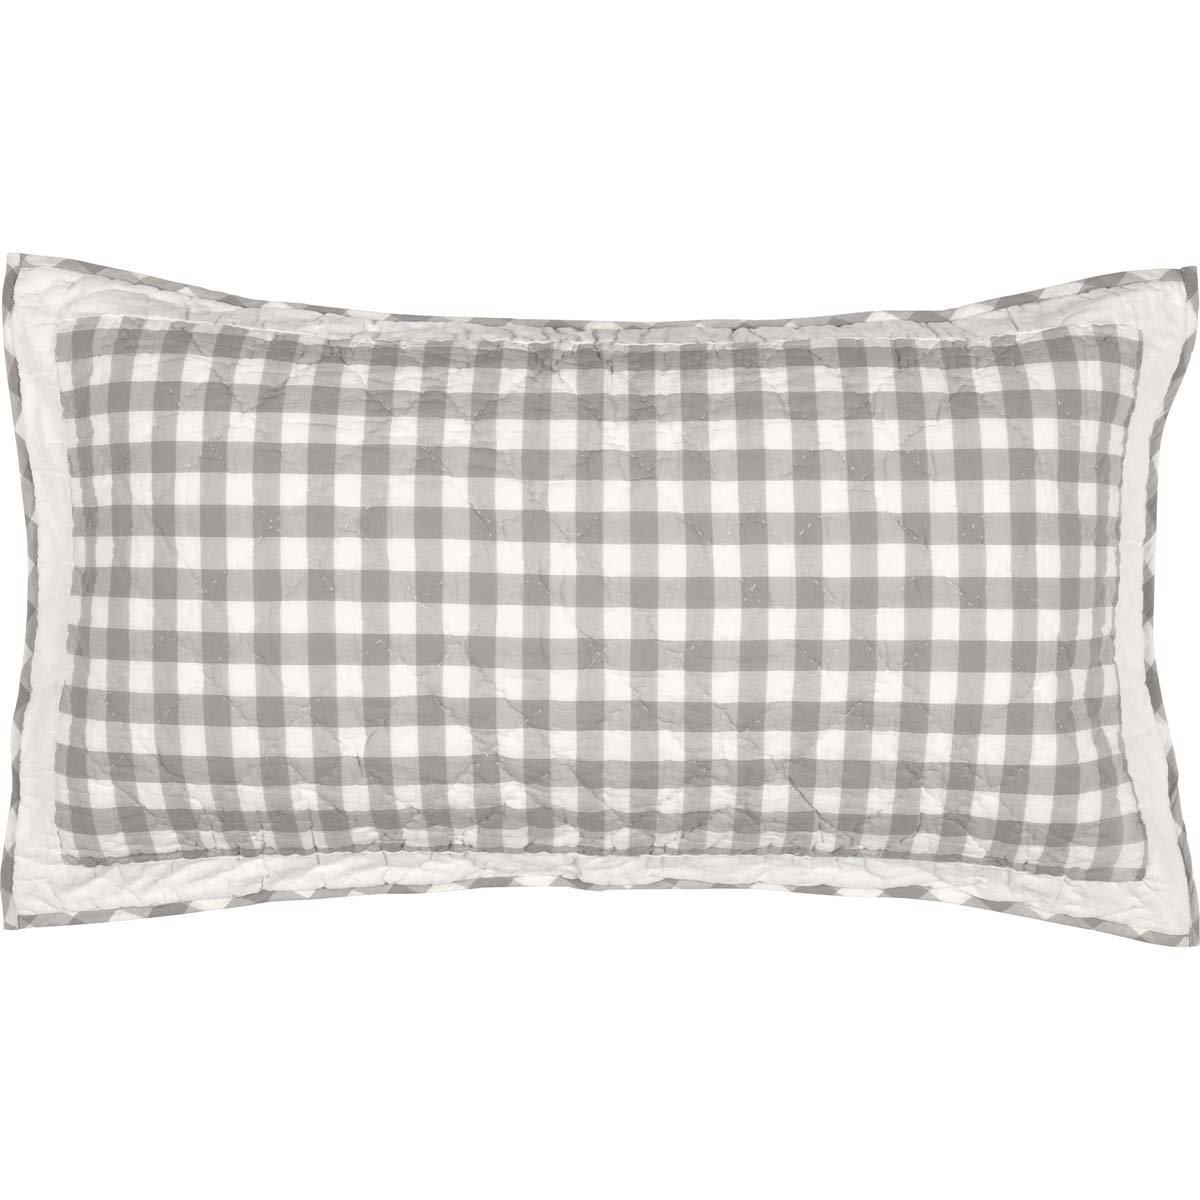 VHC Brands Farmhouse Bedding - Annie Buffalo Check White Sham, King, Grey